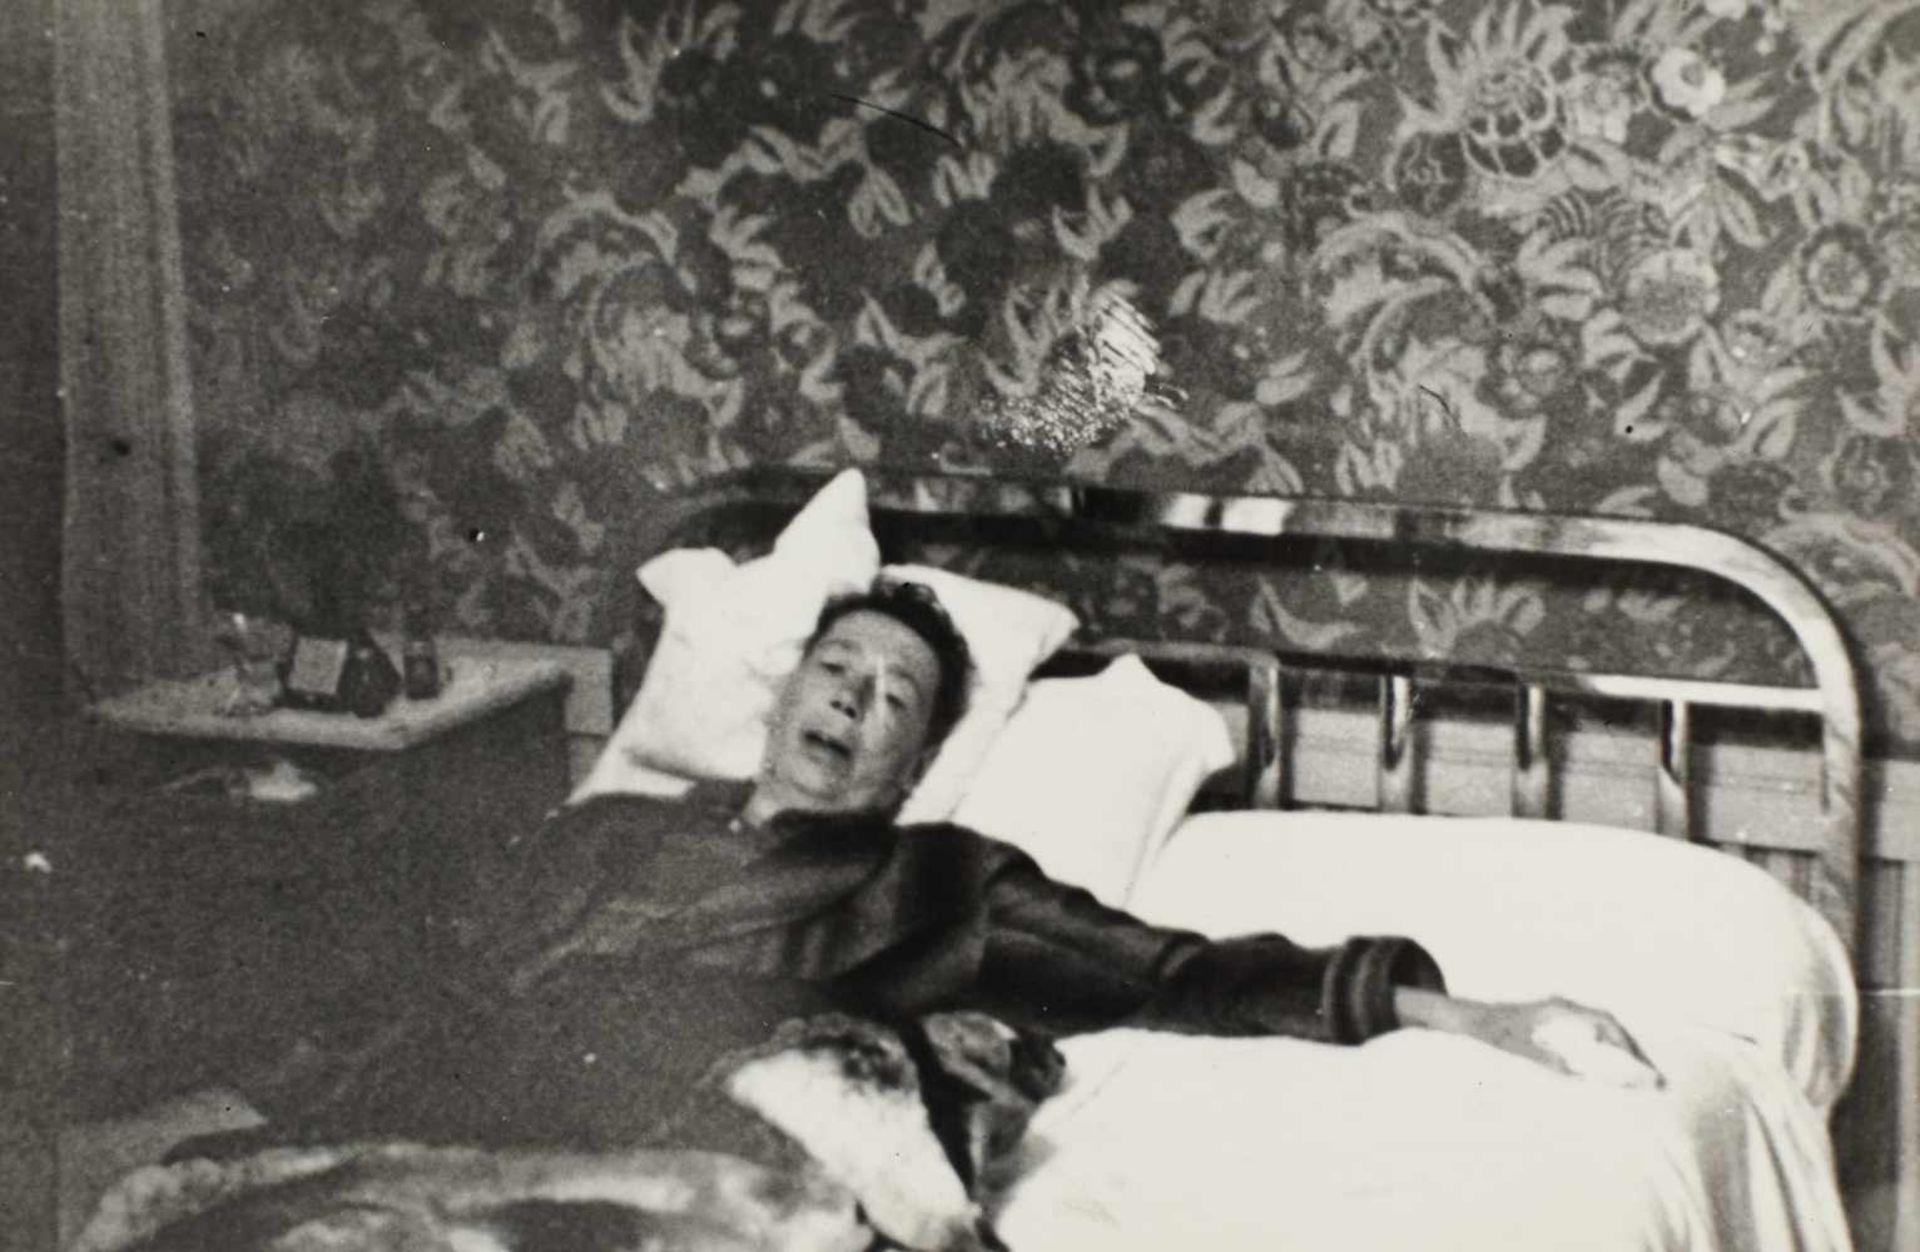 Seven photos illustrating Nicolae Titulescu, approx. 1940 - Bild 5 aus 8